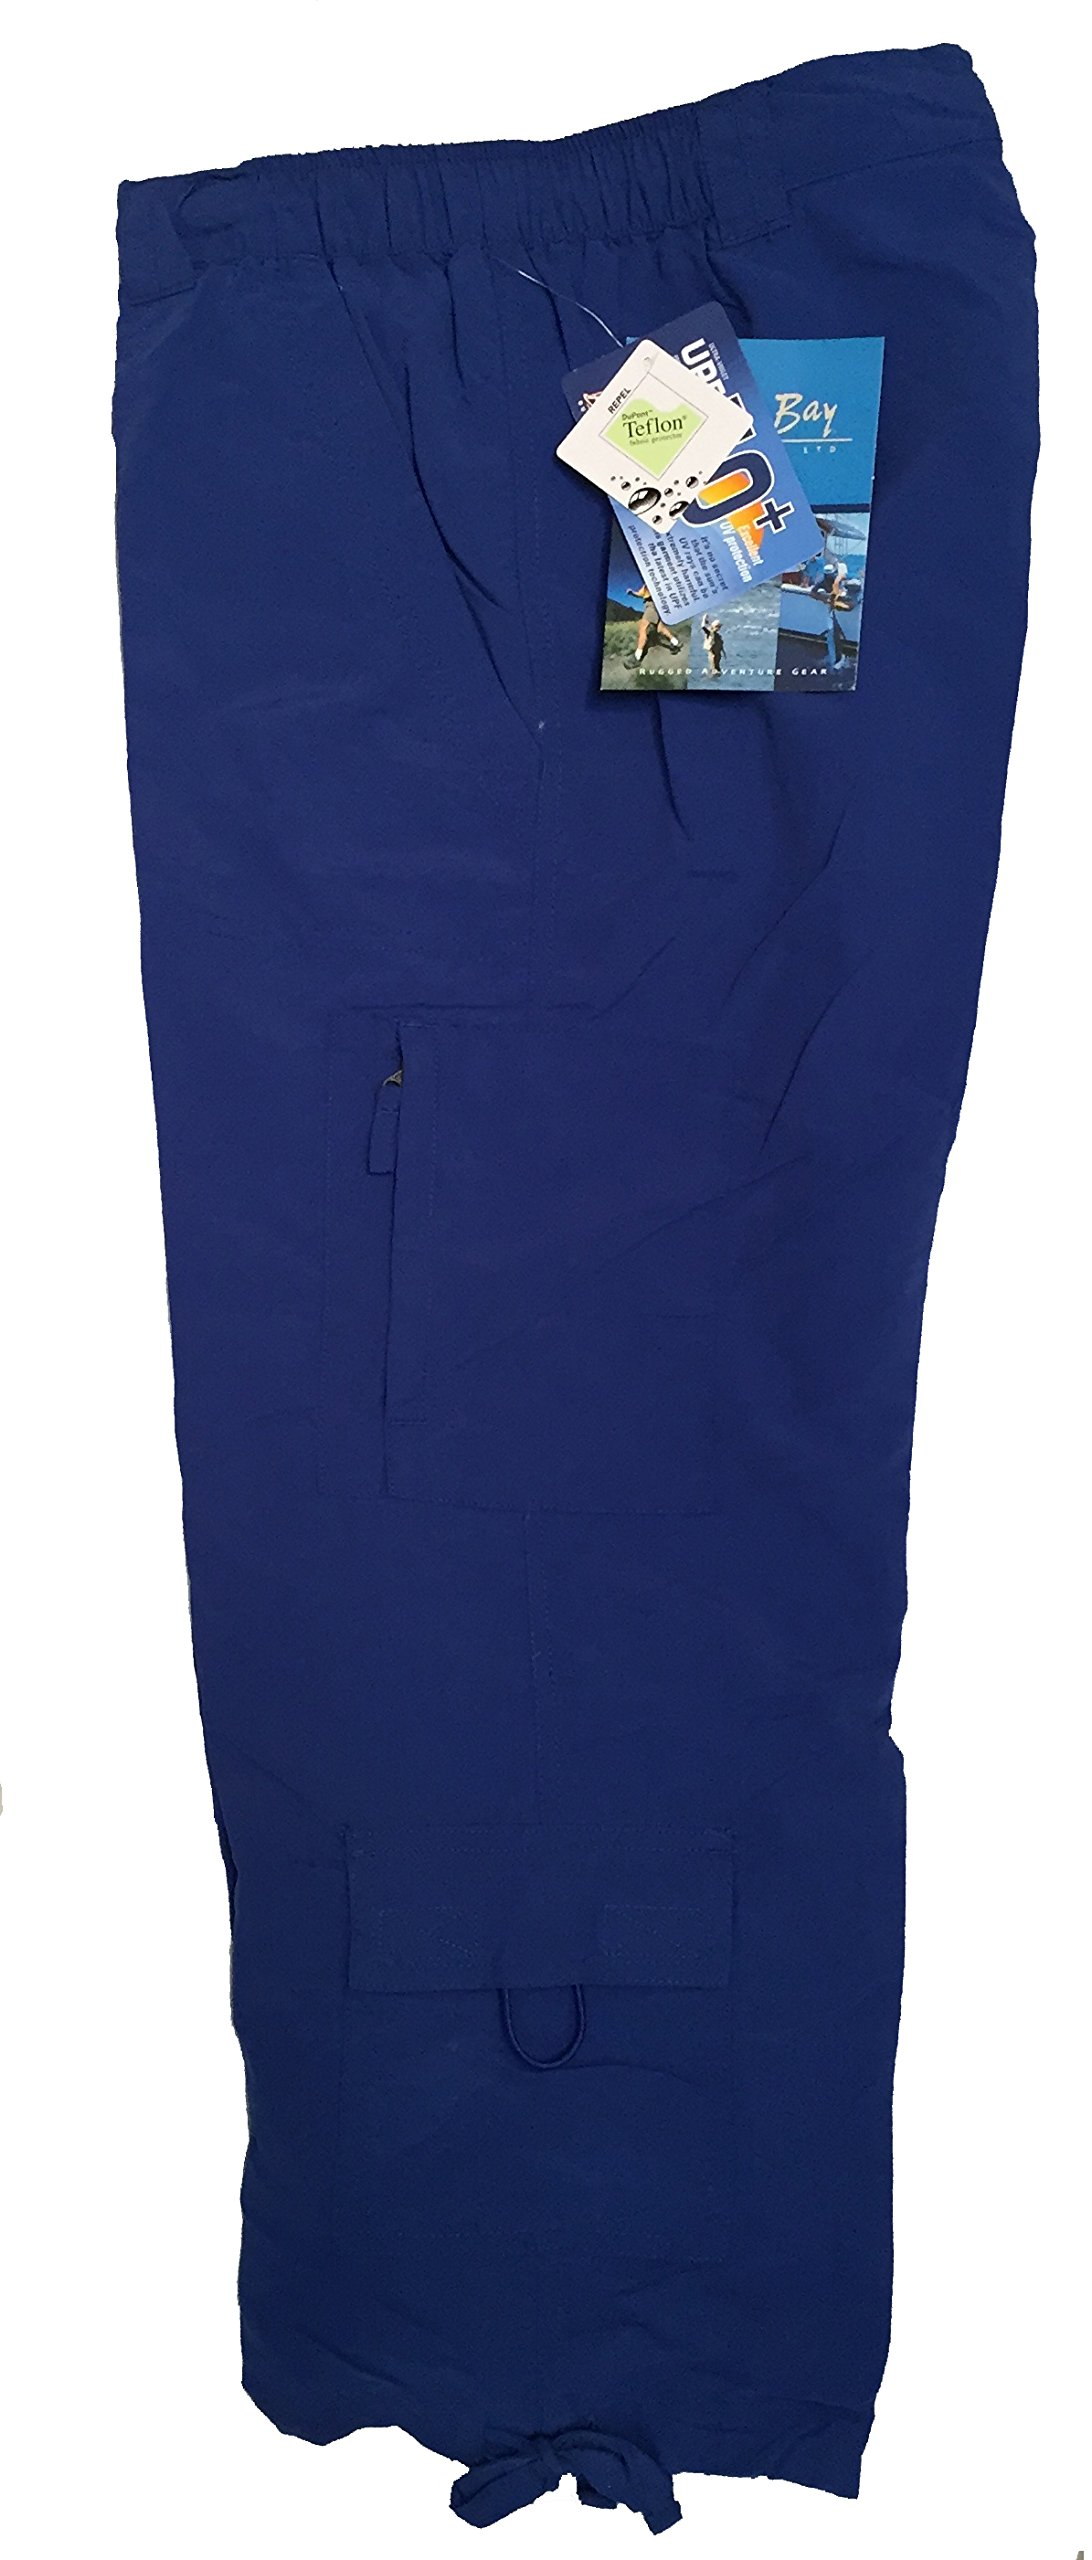 Bimini Bay Outfitters Women's Nylon Travel Capri (12, True Blue) by Bimini Bay Outfitters